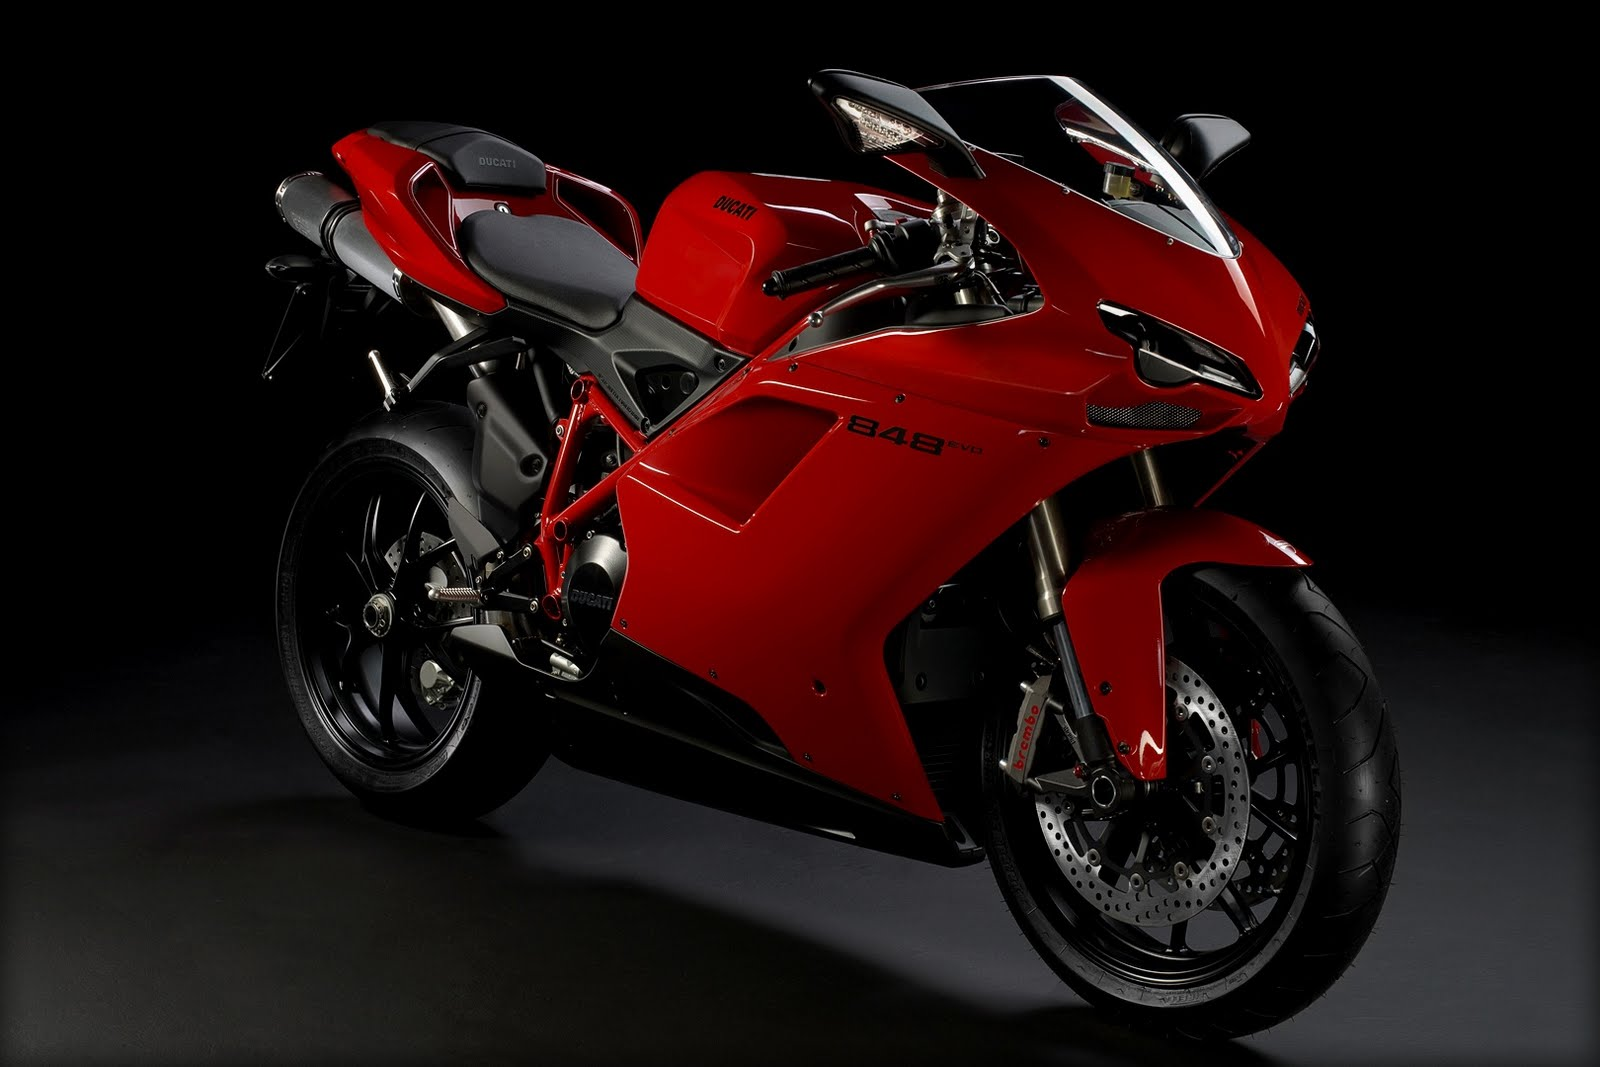 Top Motorcycle Wallpapers 2011 Ducati 848 Evo Motorcycle 1600x1067